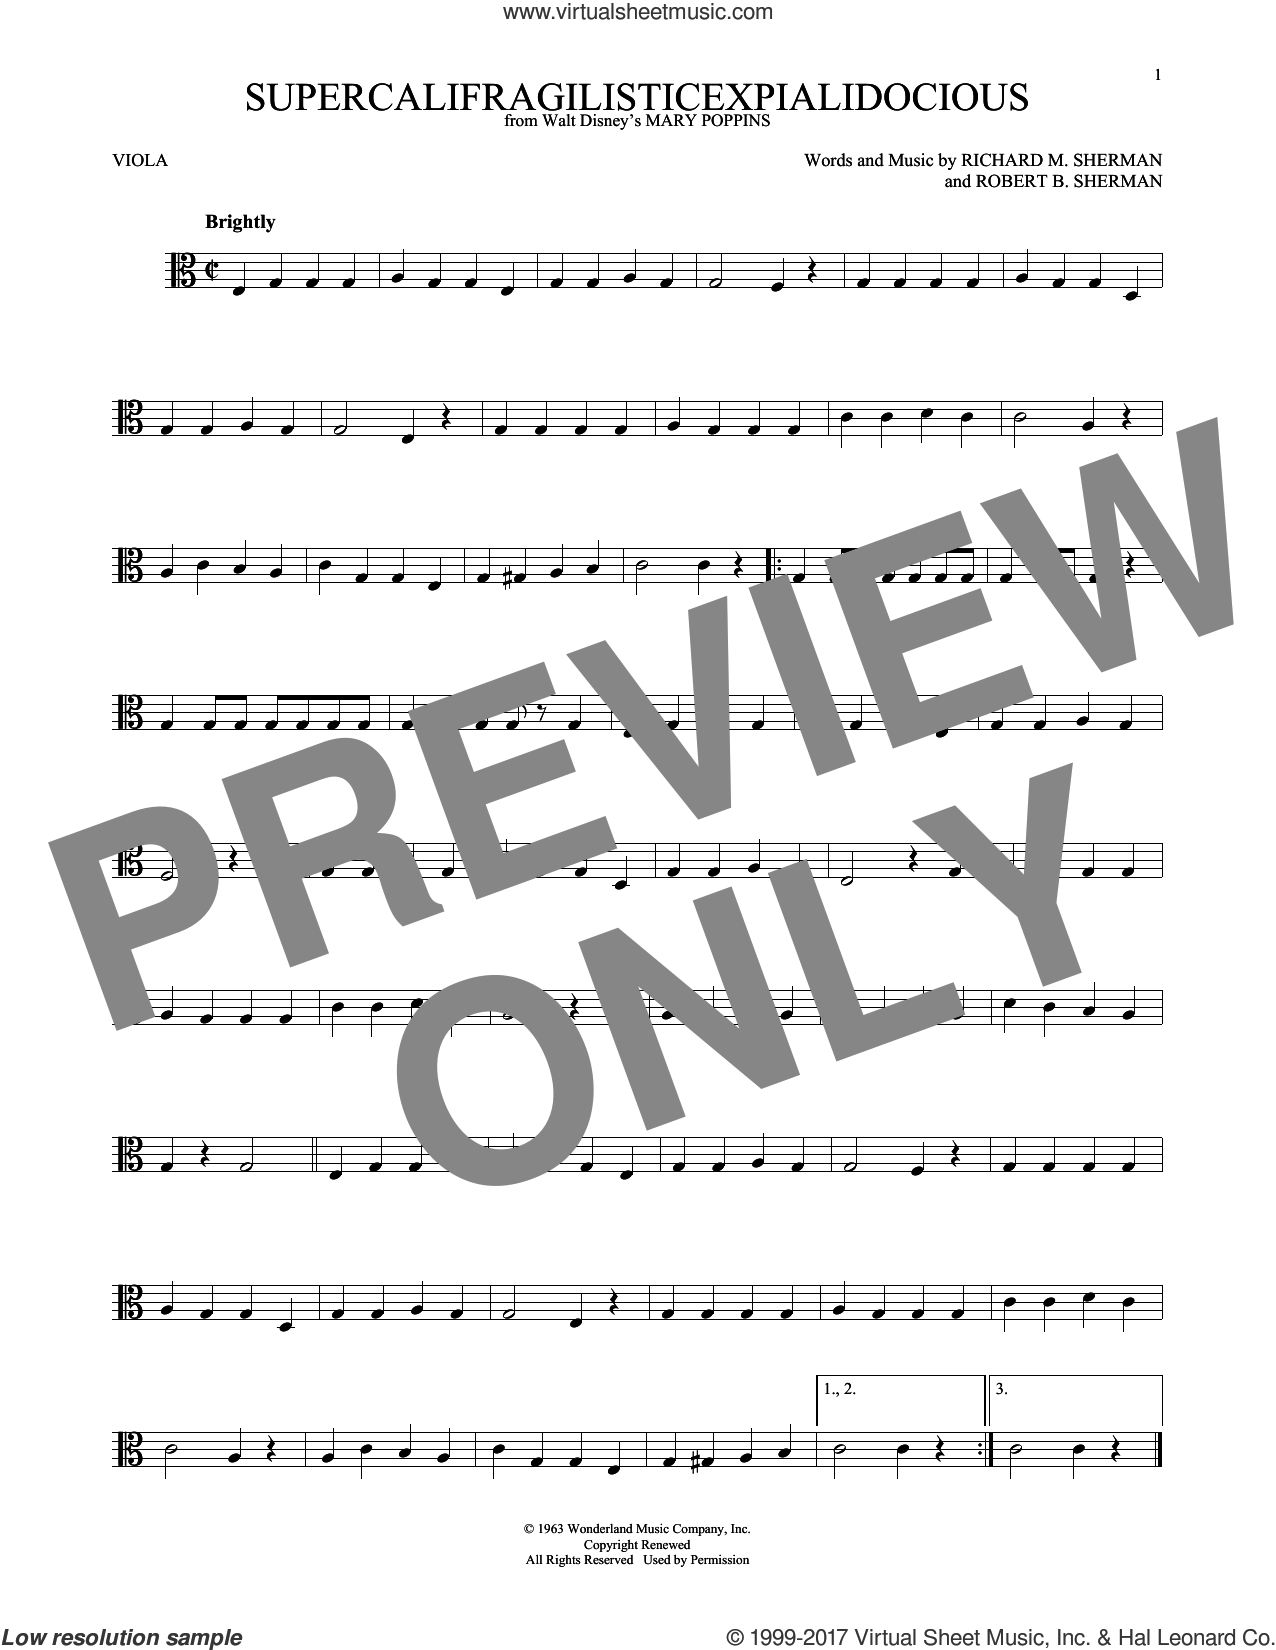 Supercalifragilisticexpialidocious sheet music for viola solo by Robert B. Sherman and Richard M. Sherman, intermediate skill level